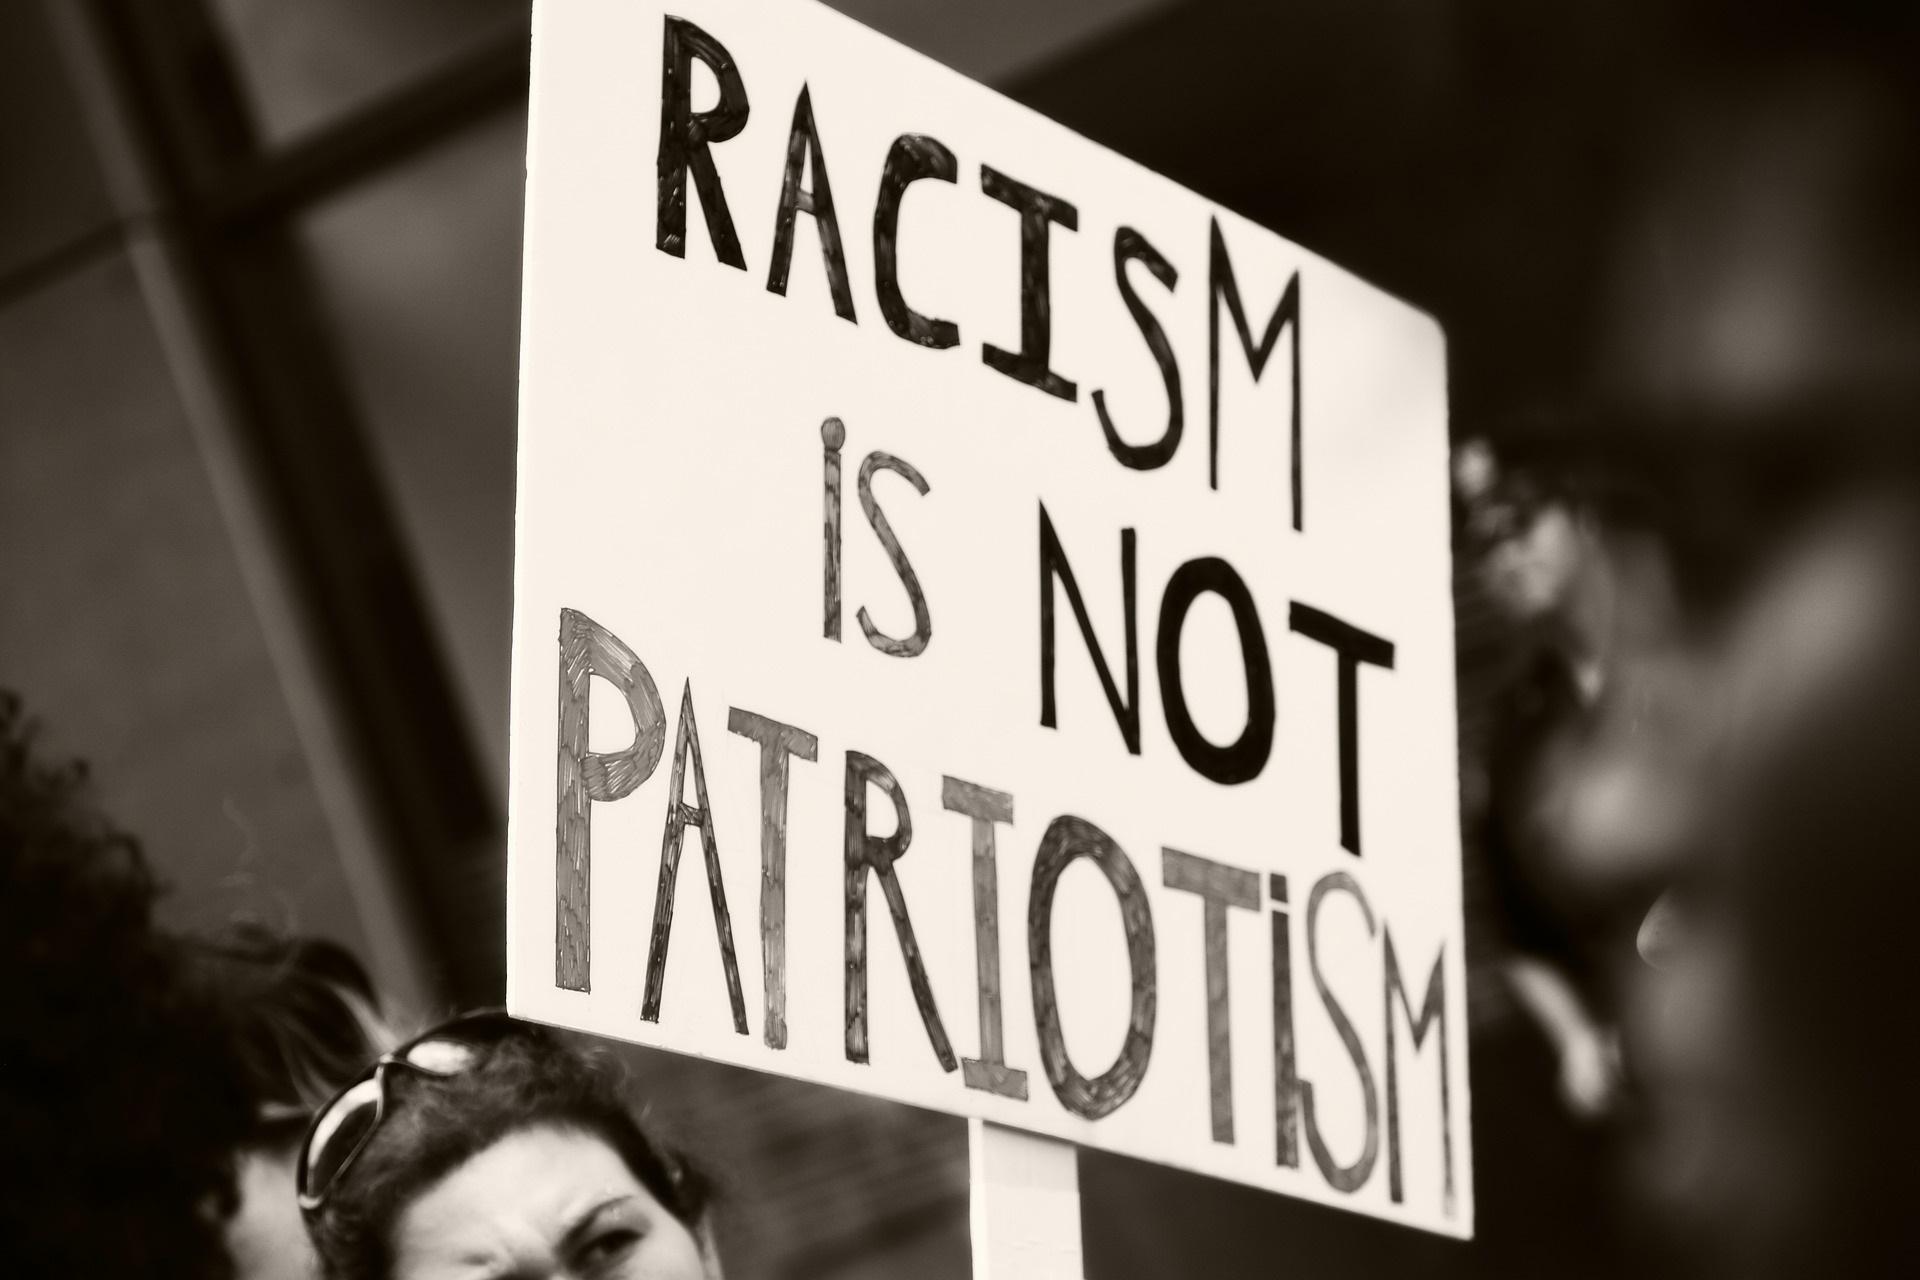 Racism is not Patriotism protest sign